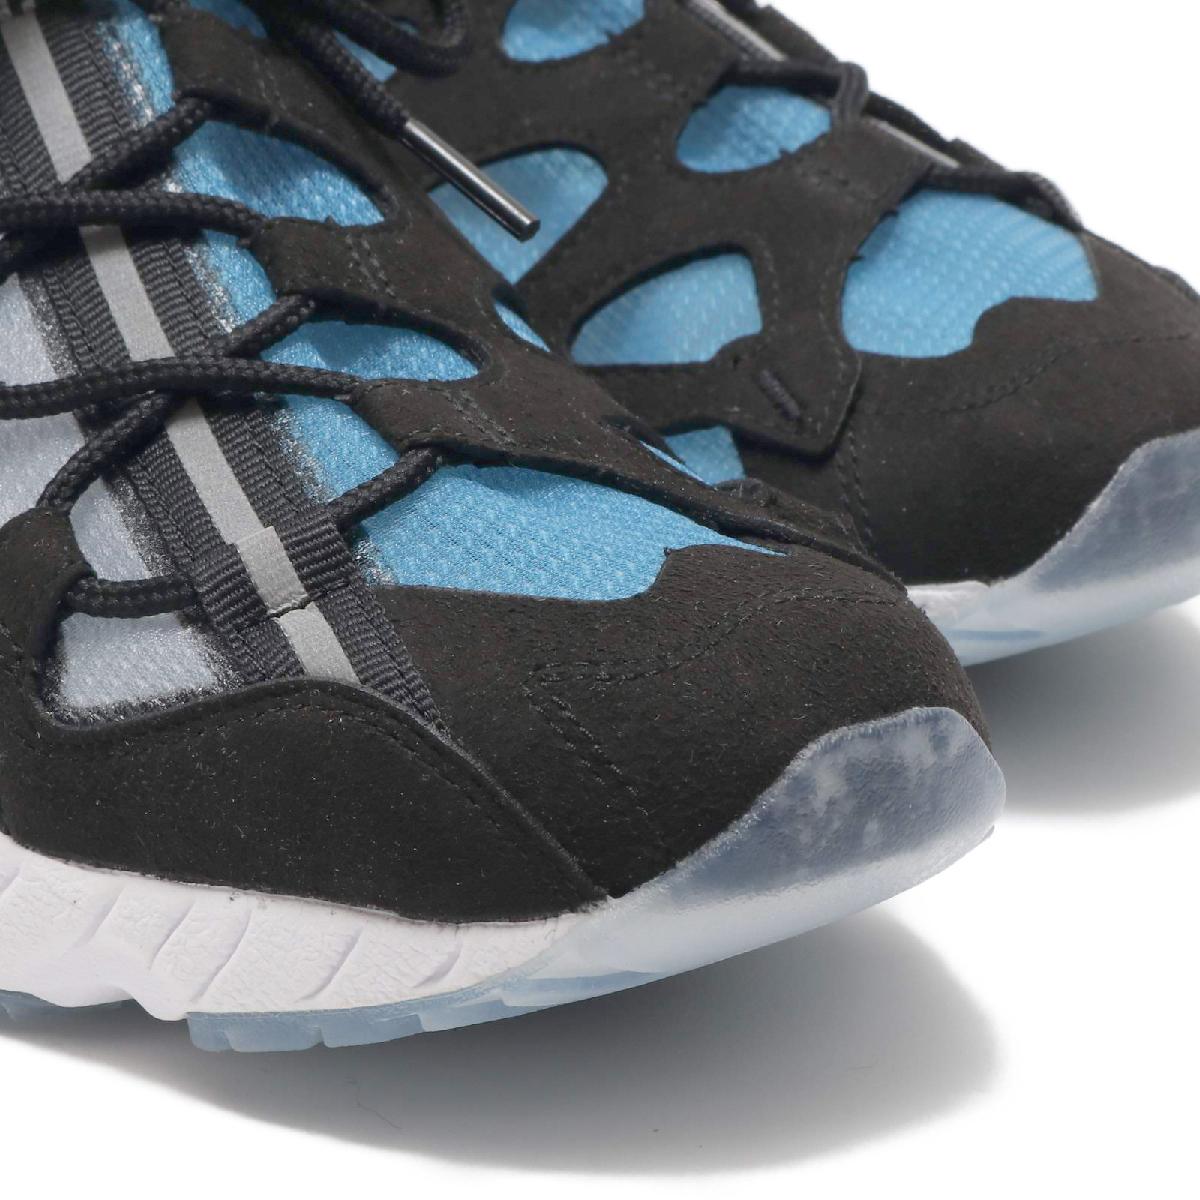 f:id:sneakerscaffetokyo:20190704091312j:plain